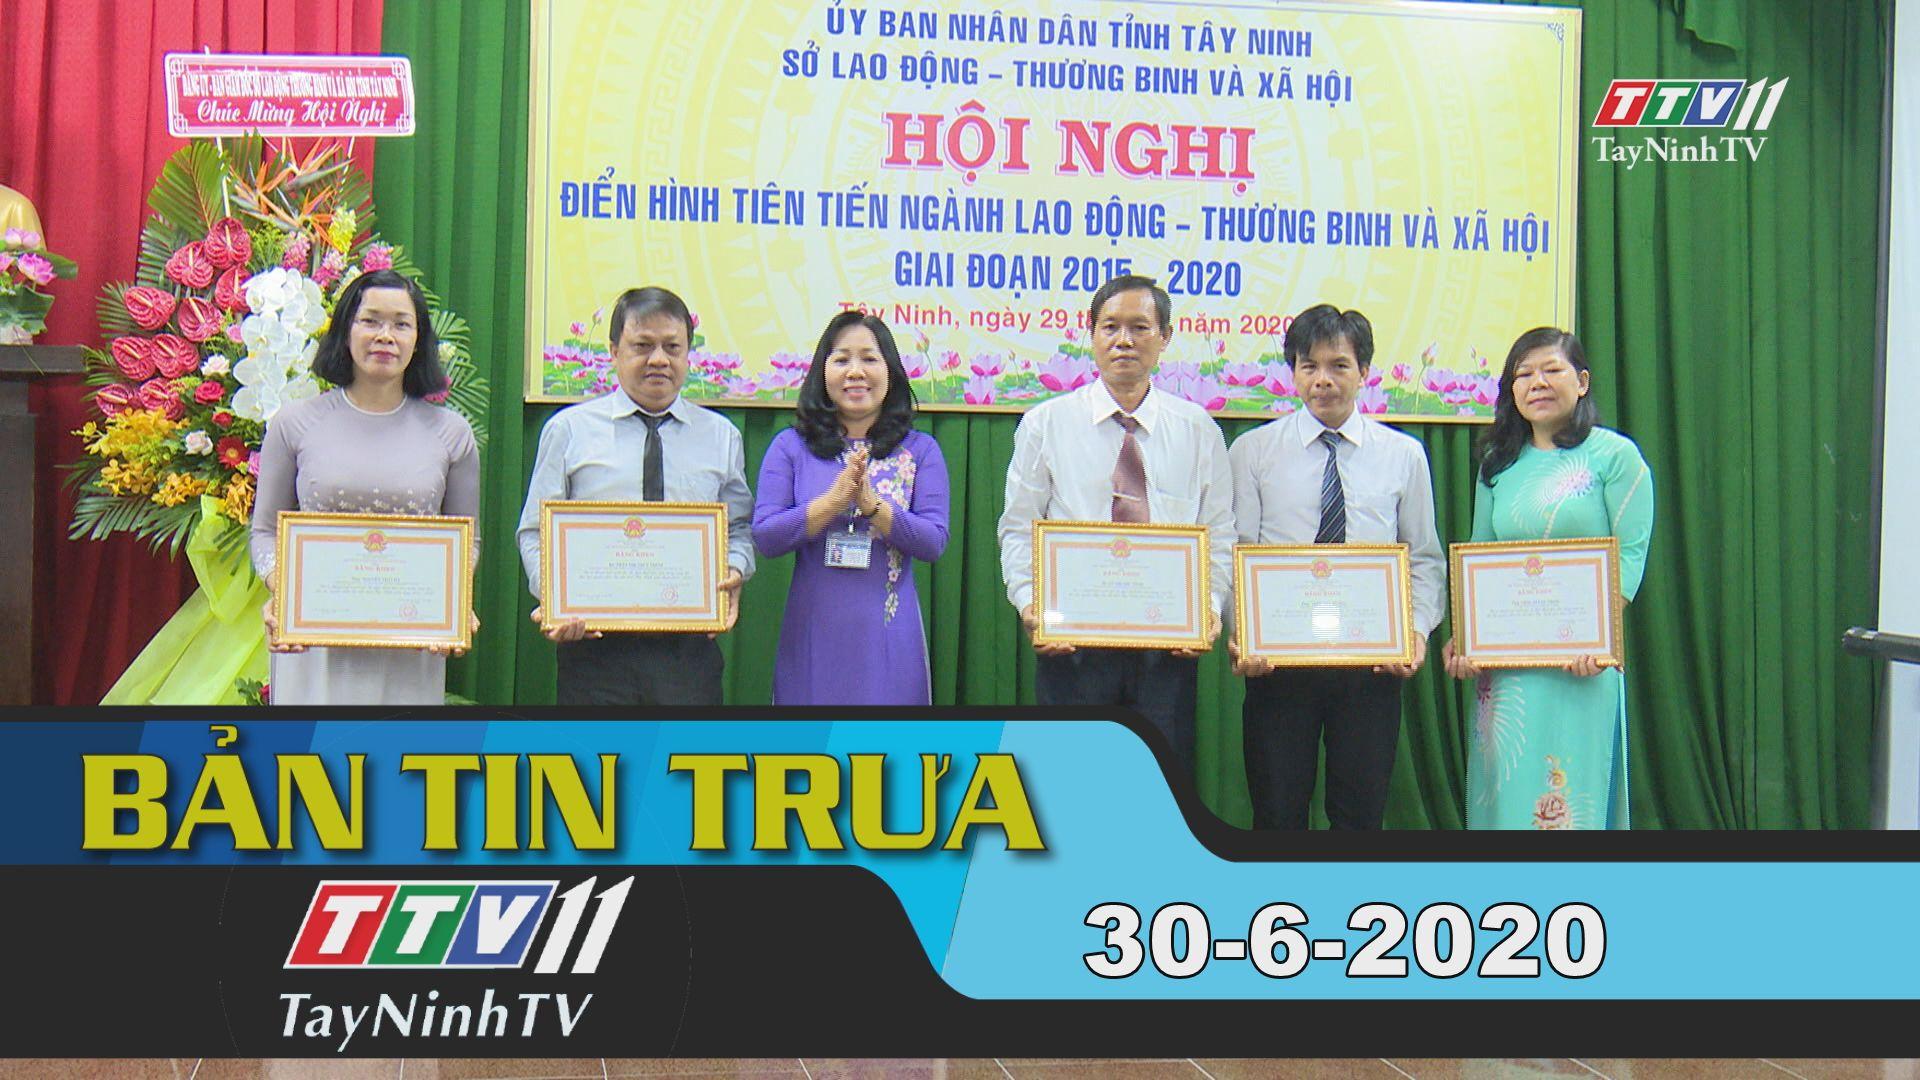 Bản tin trưa 30-6-2020 | Tin tức hôm nay | TayNinhTV